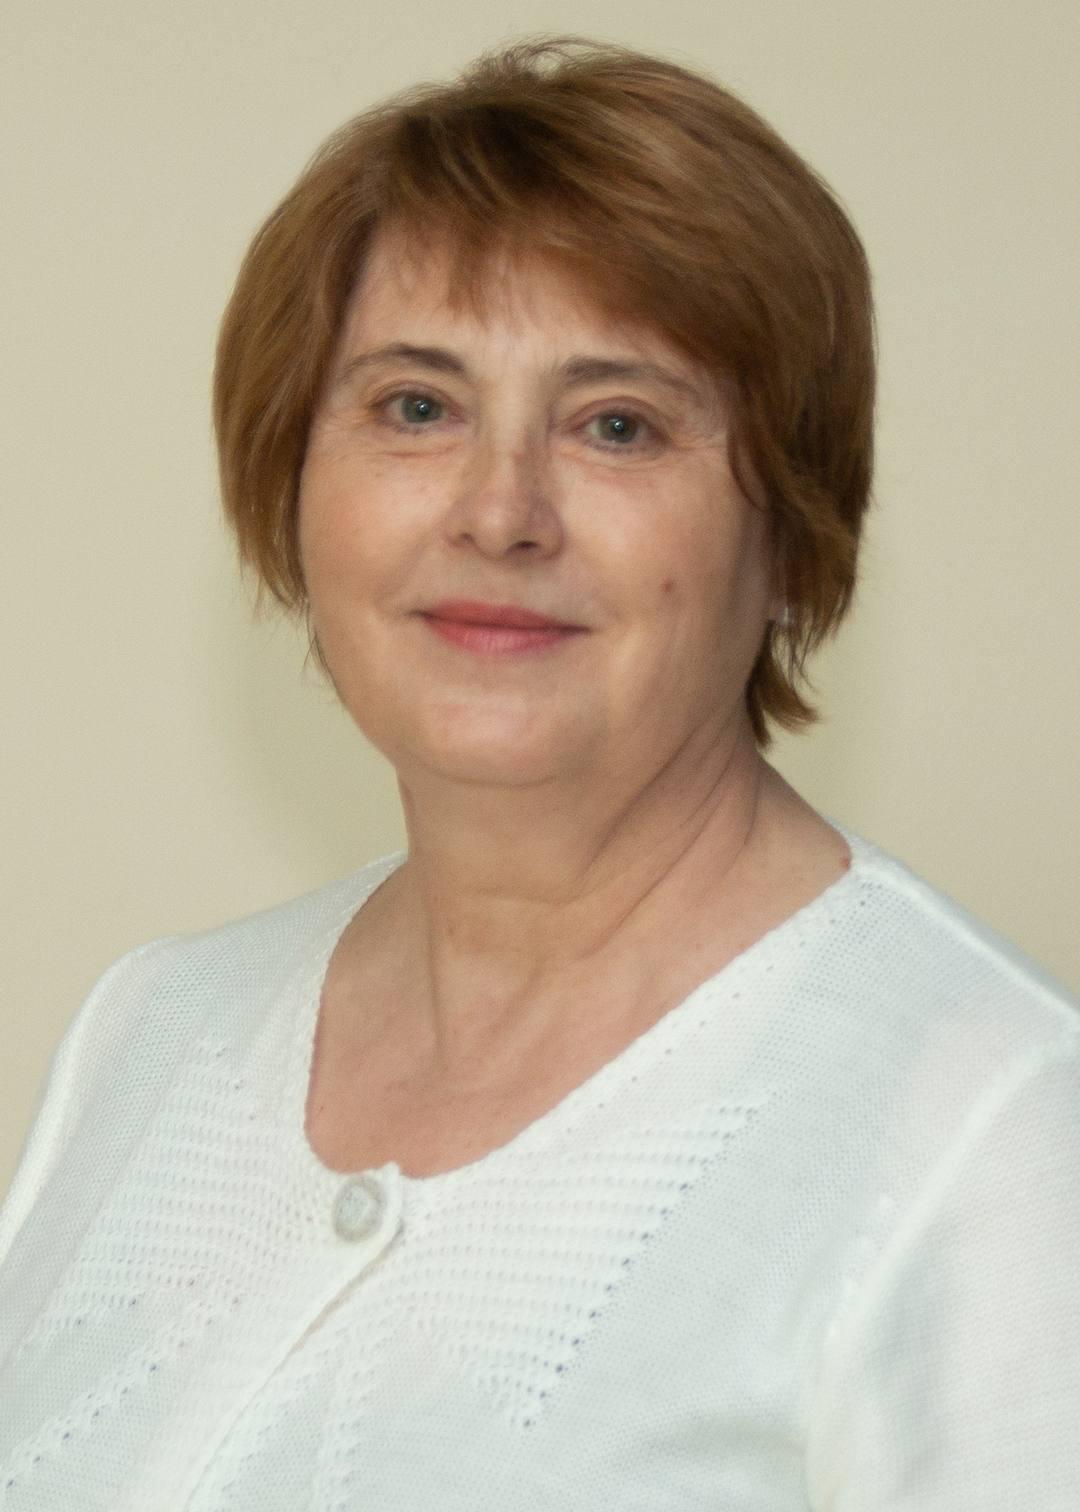 Савельева Людмила Викторовна